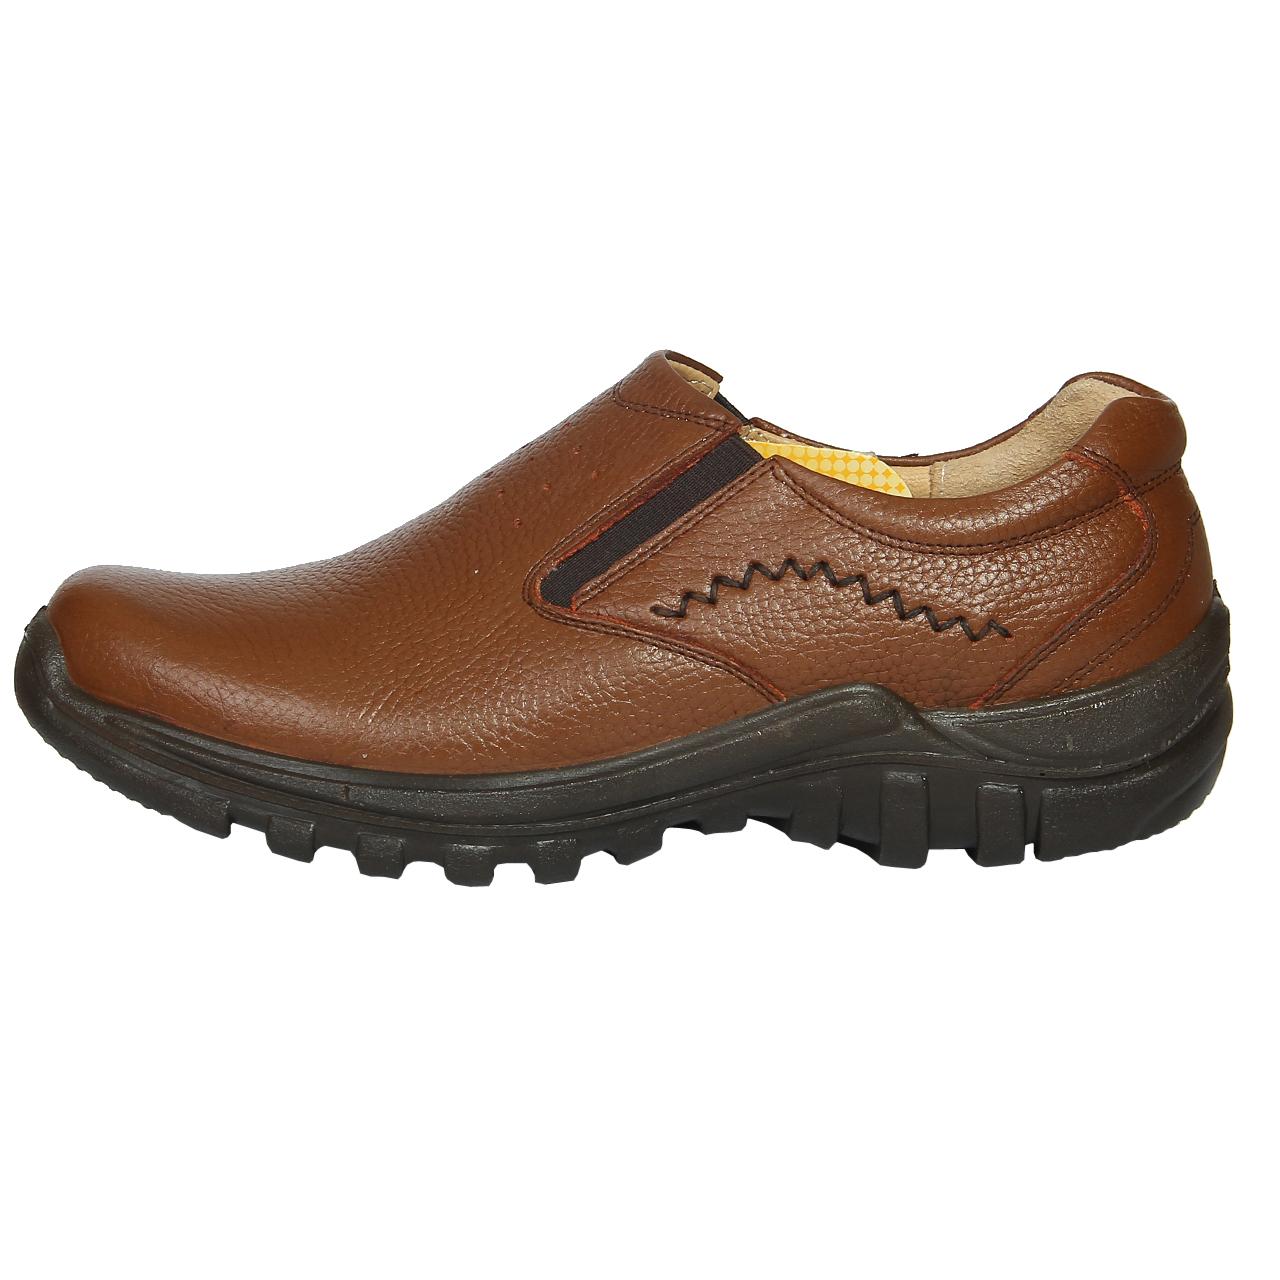 کفش روزمره مردانه مدل کمپ کد 40